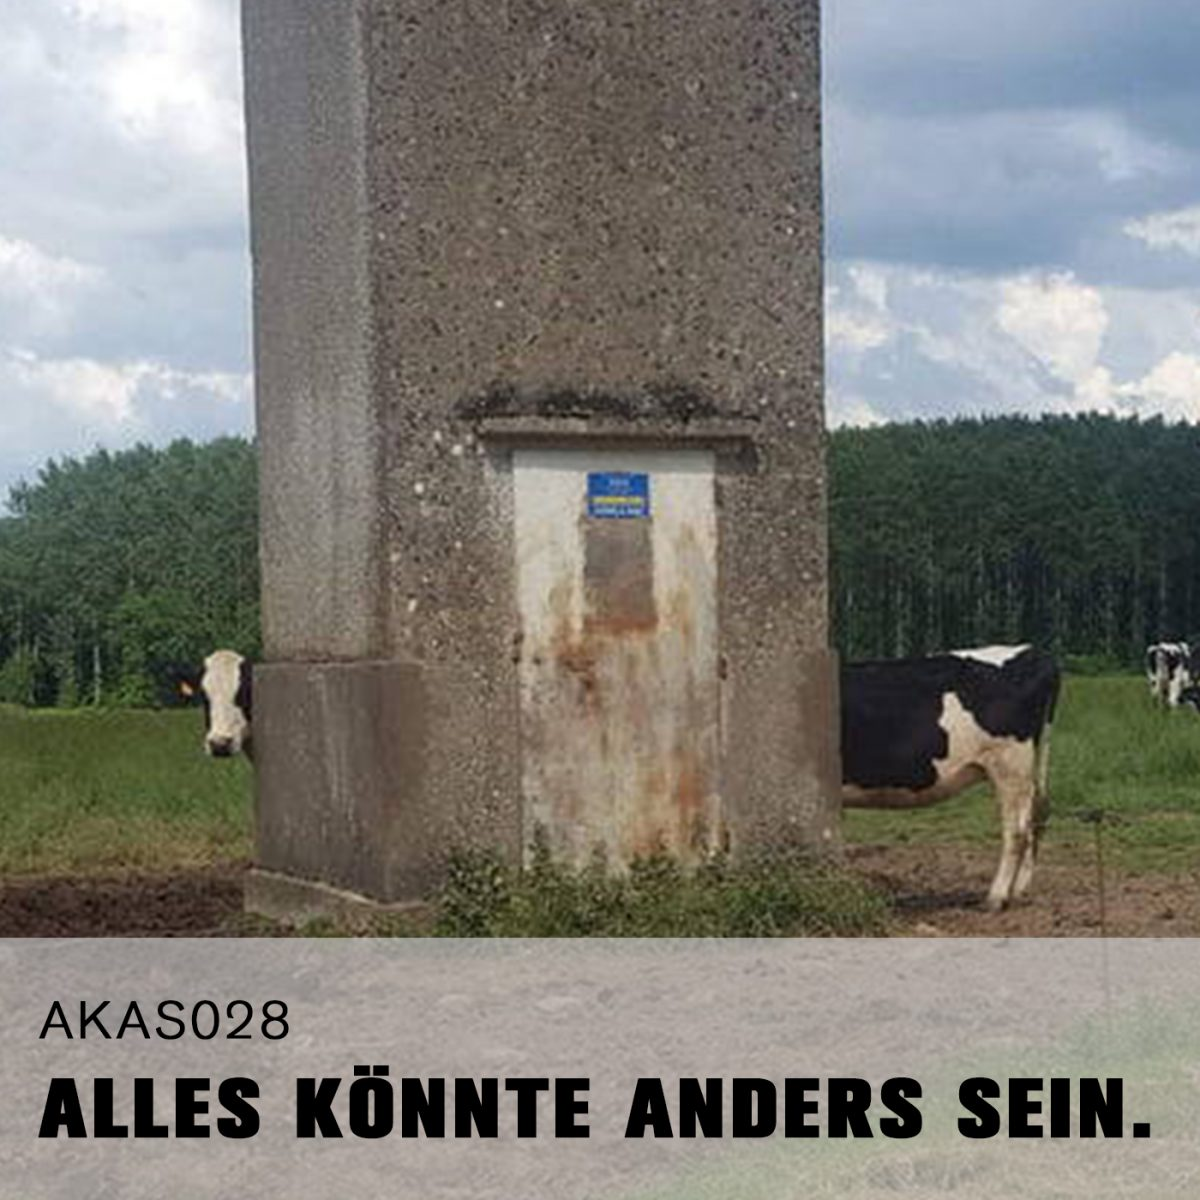 AKAS028 Fliegen auf Bul(l)ettenbrötchen